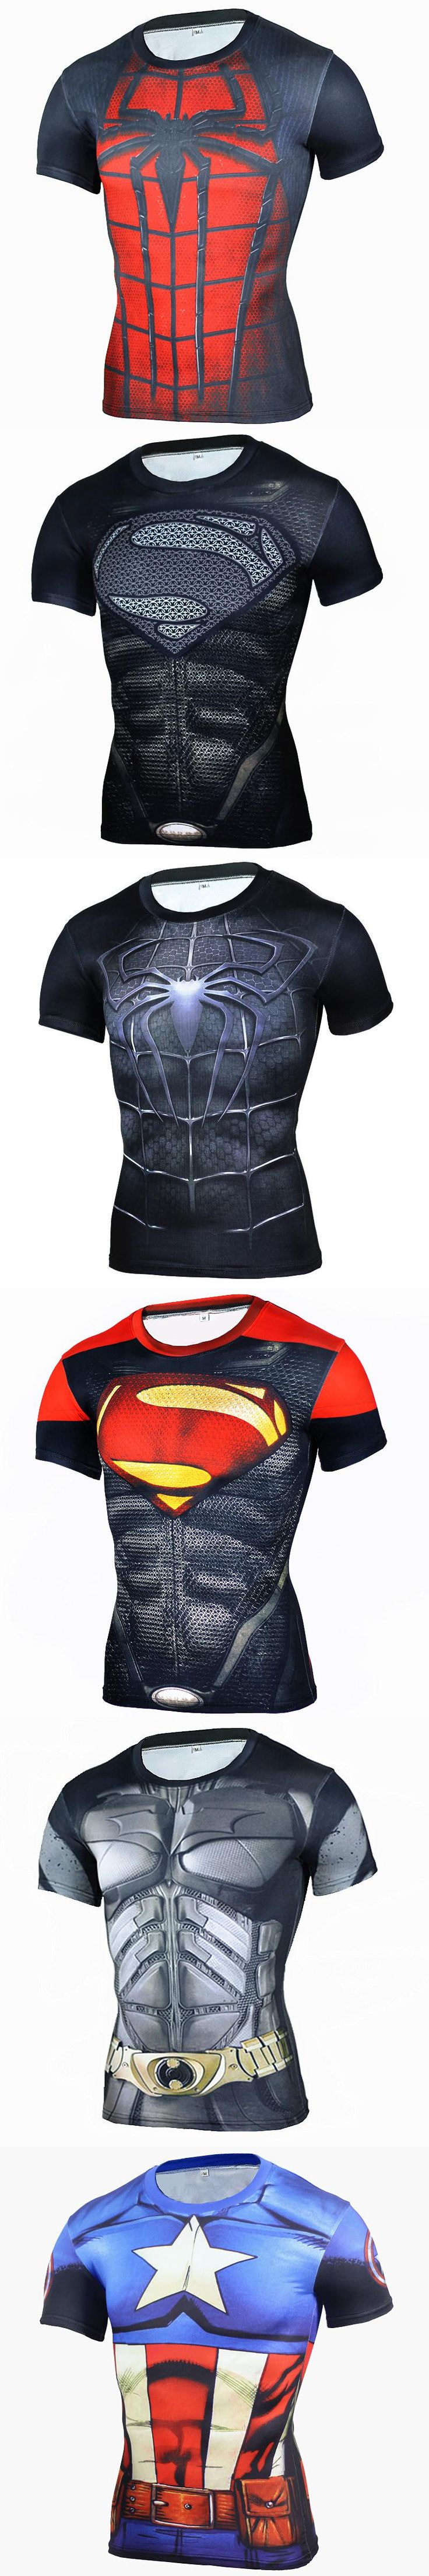 Brand Clothing 2016 Superhero Compression Shirt 3D Captain America Punisher T Shirt Bodybuilding Crossfit t-shirt